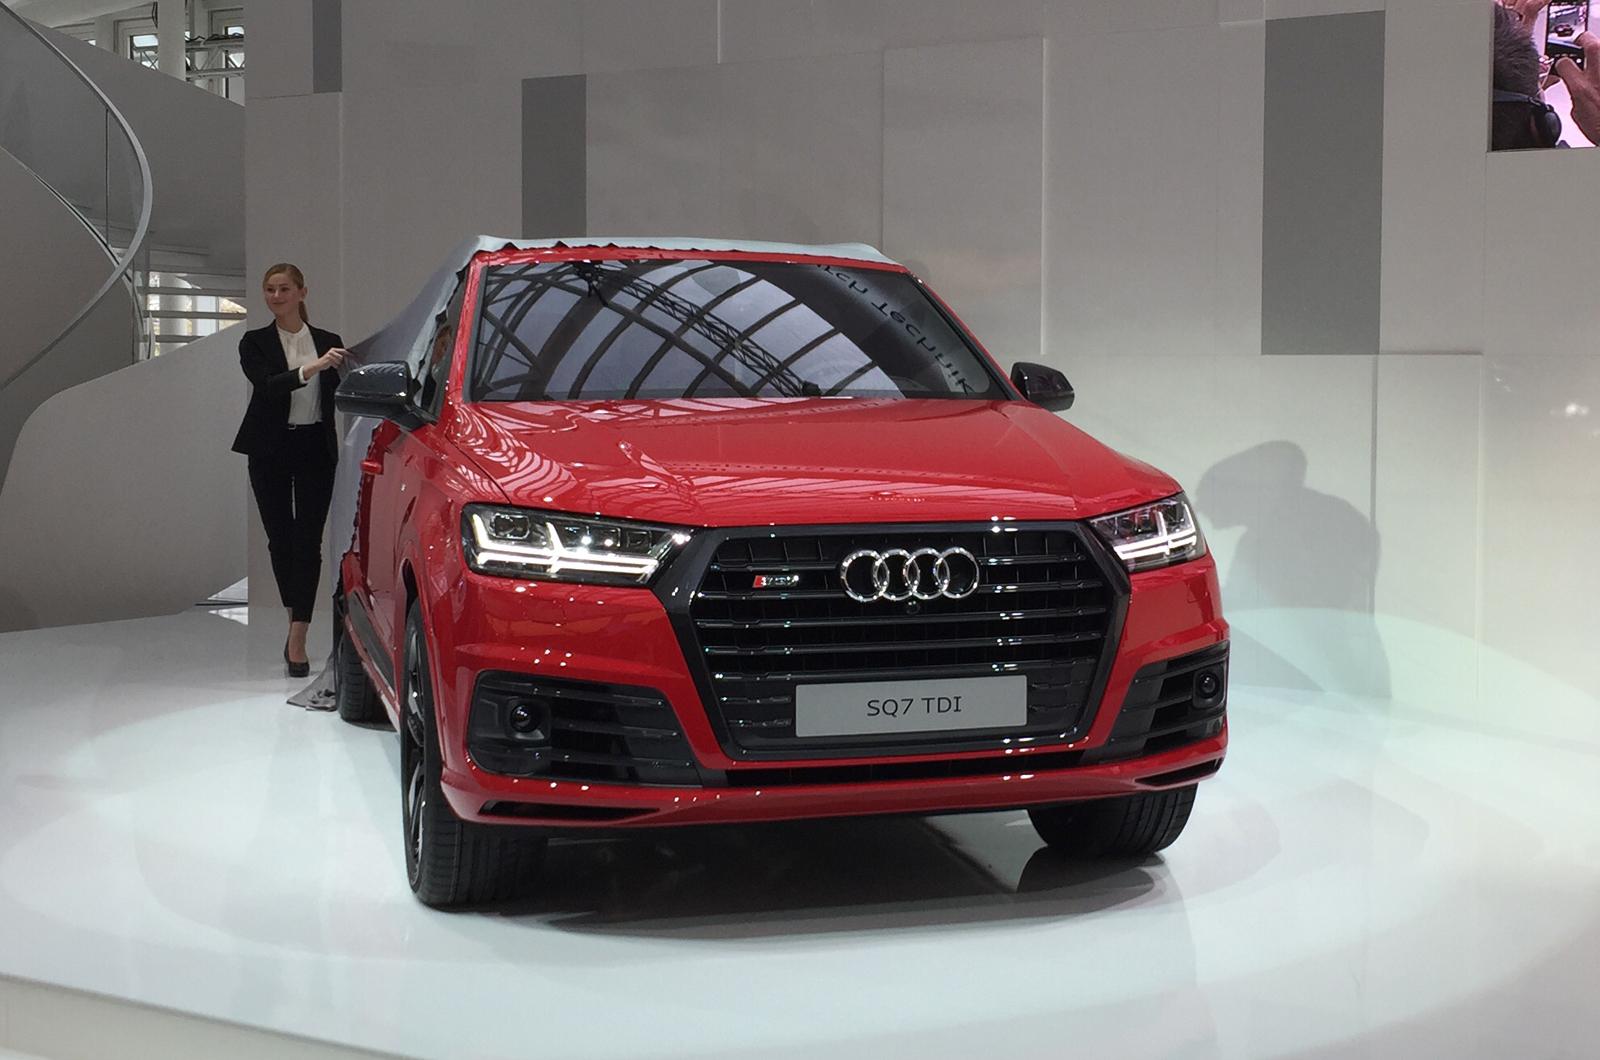 Audi audi sq7 tdi : New Audi SQ7 revealed | Autocar